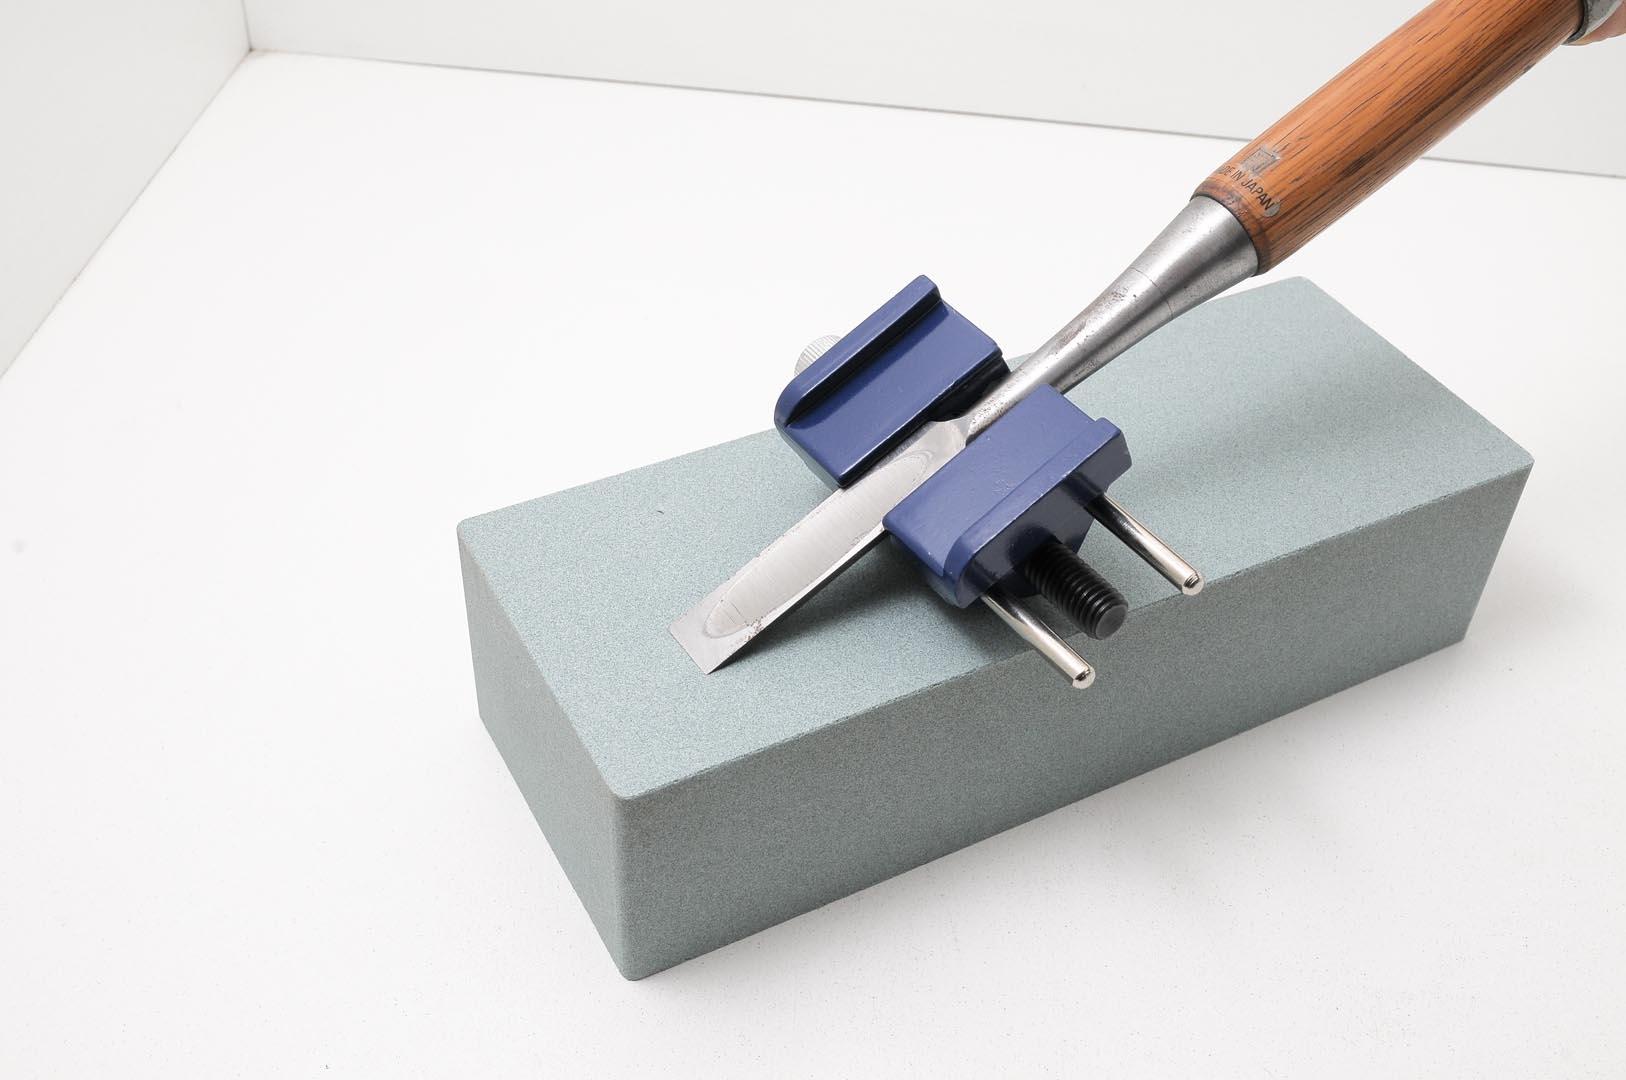 GUB0008-Guia simple de afilar formones o hoja de cepillo CON RODAJE-max-2.